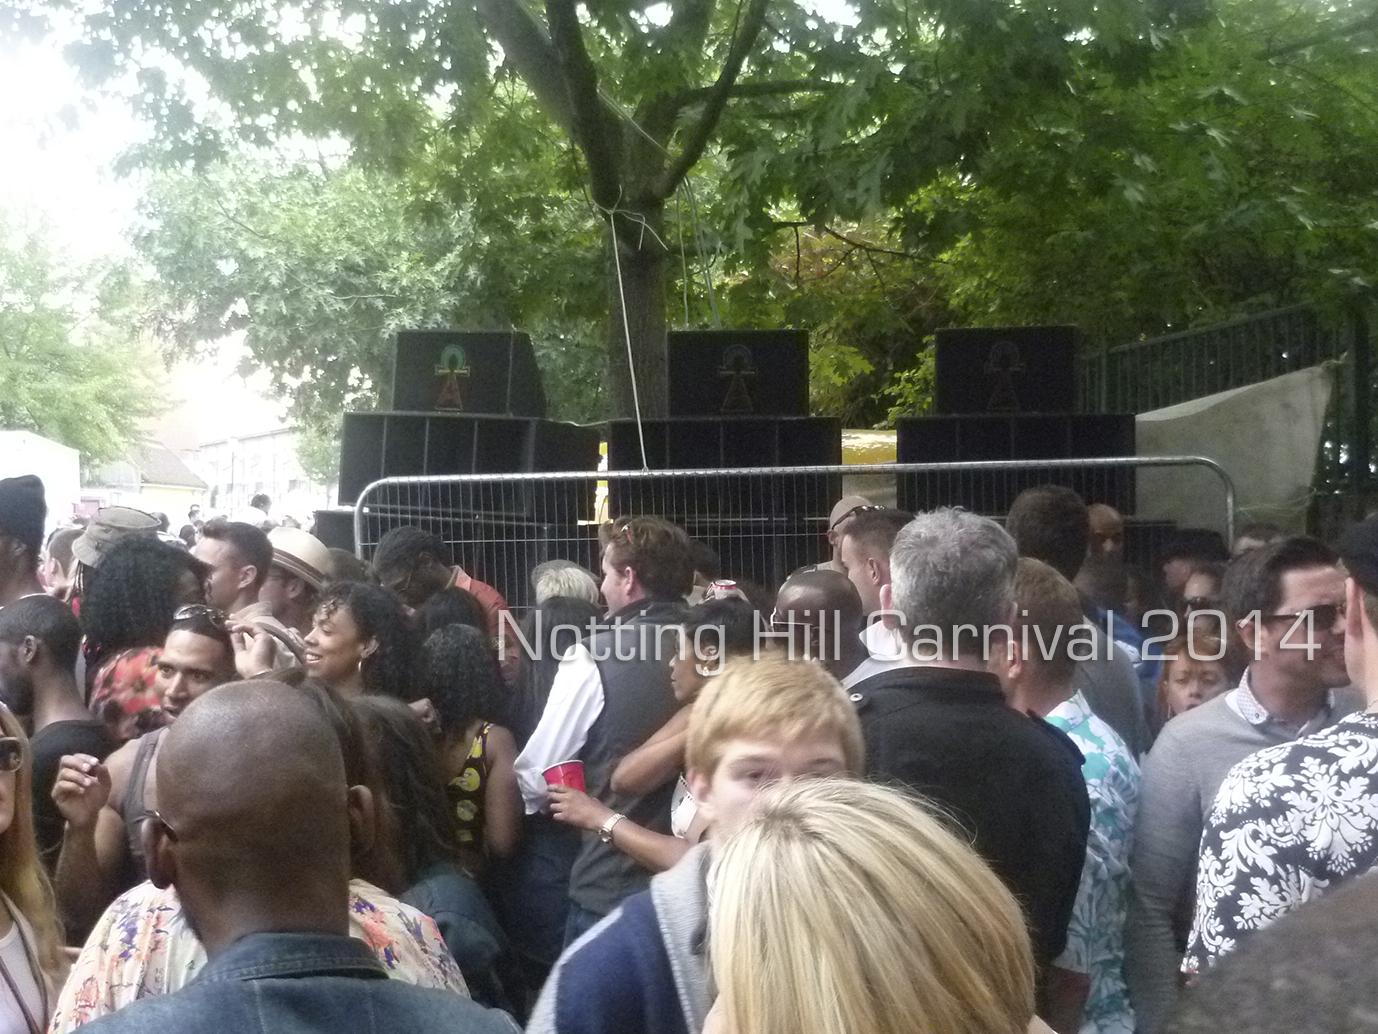 Notting-Hill-Carnival-2014-Street-Sound-System-28